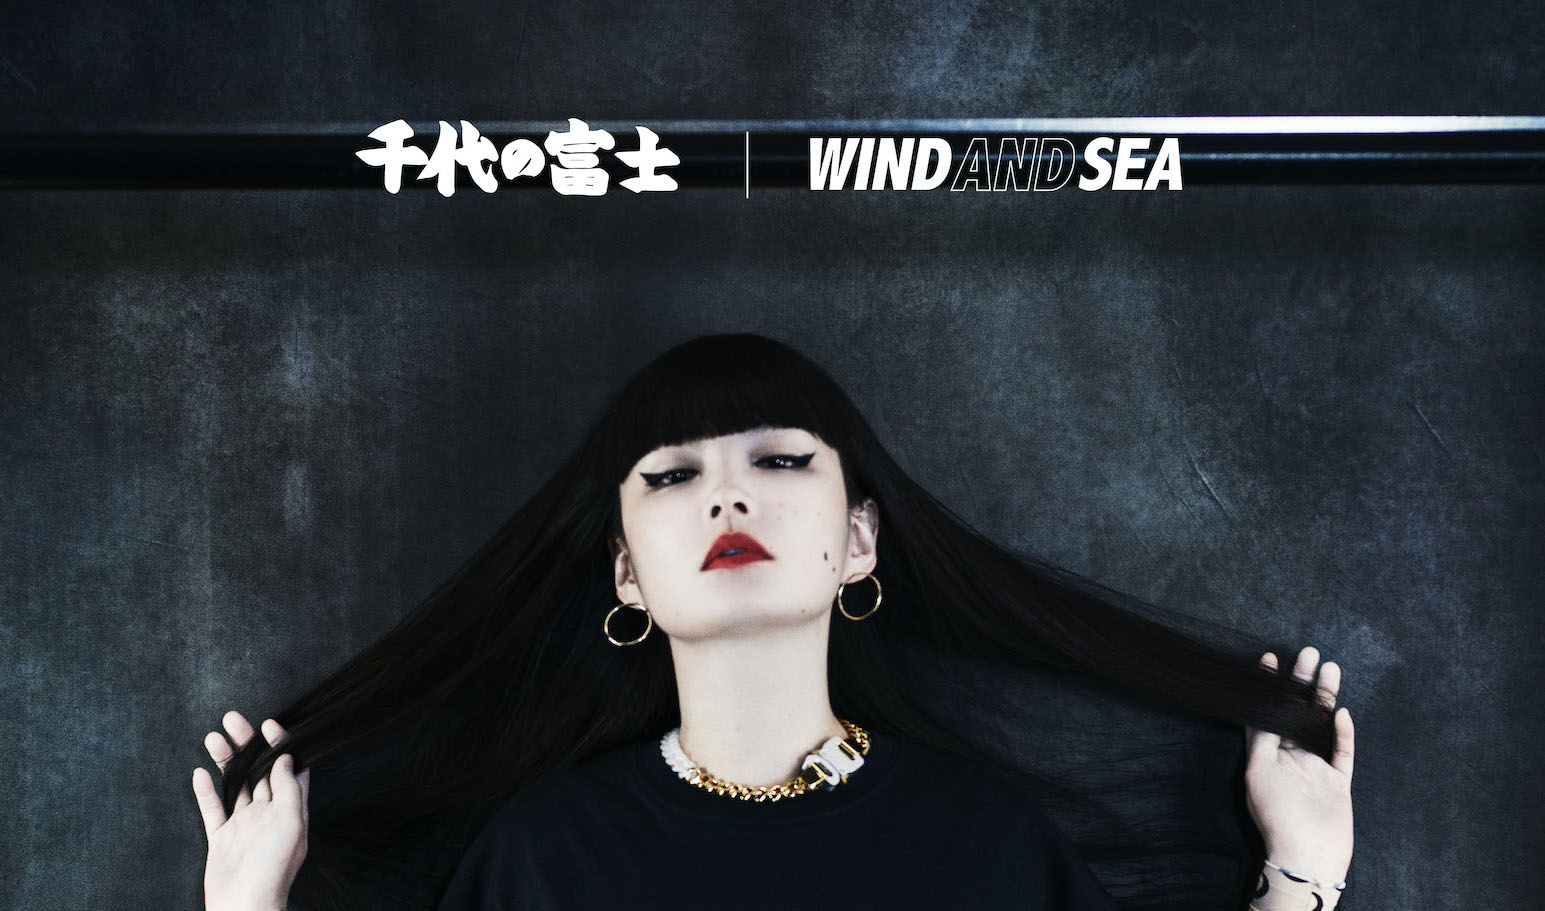 「WIND AND SEA×千代の富士関」リステア別注Tシャツ発売